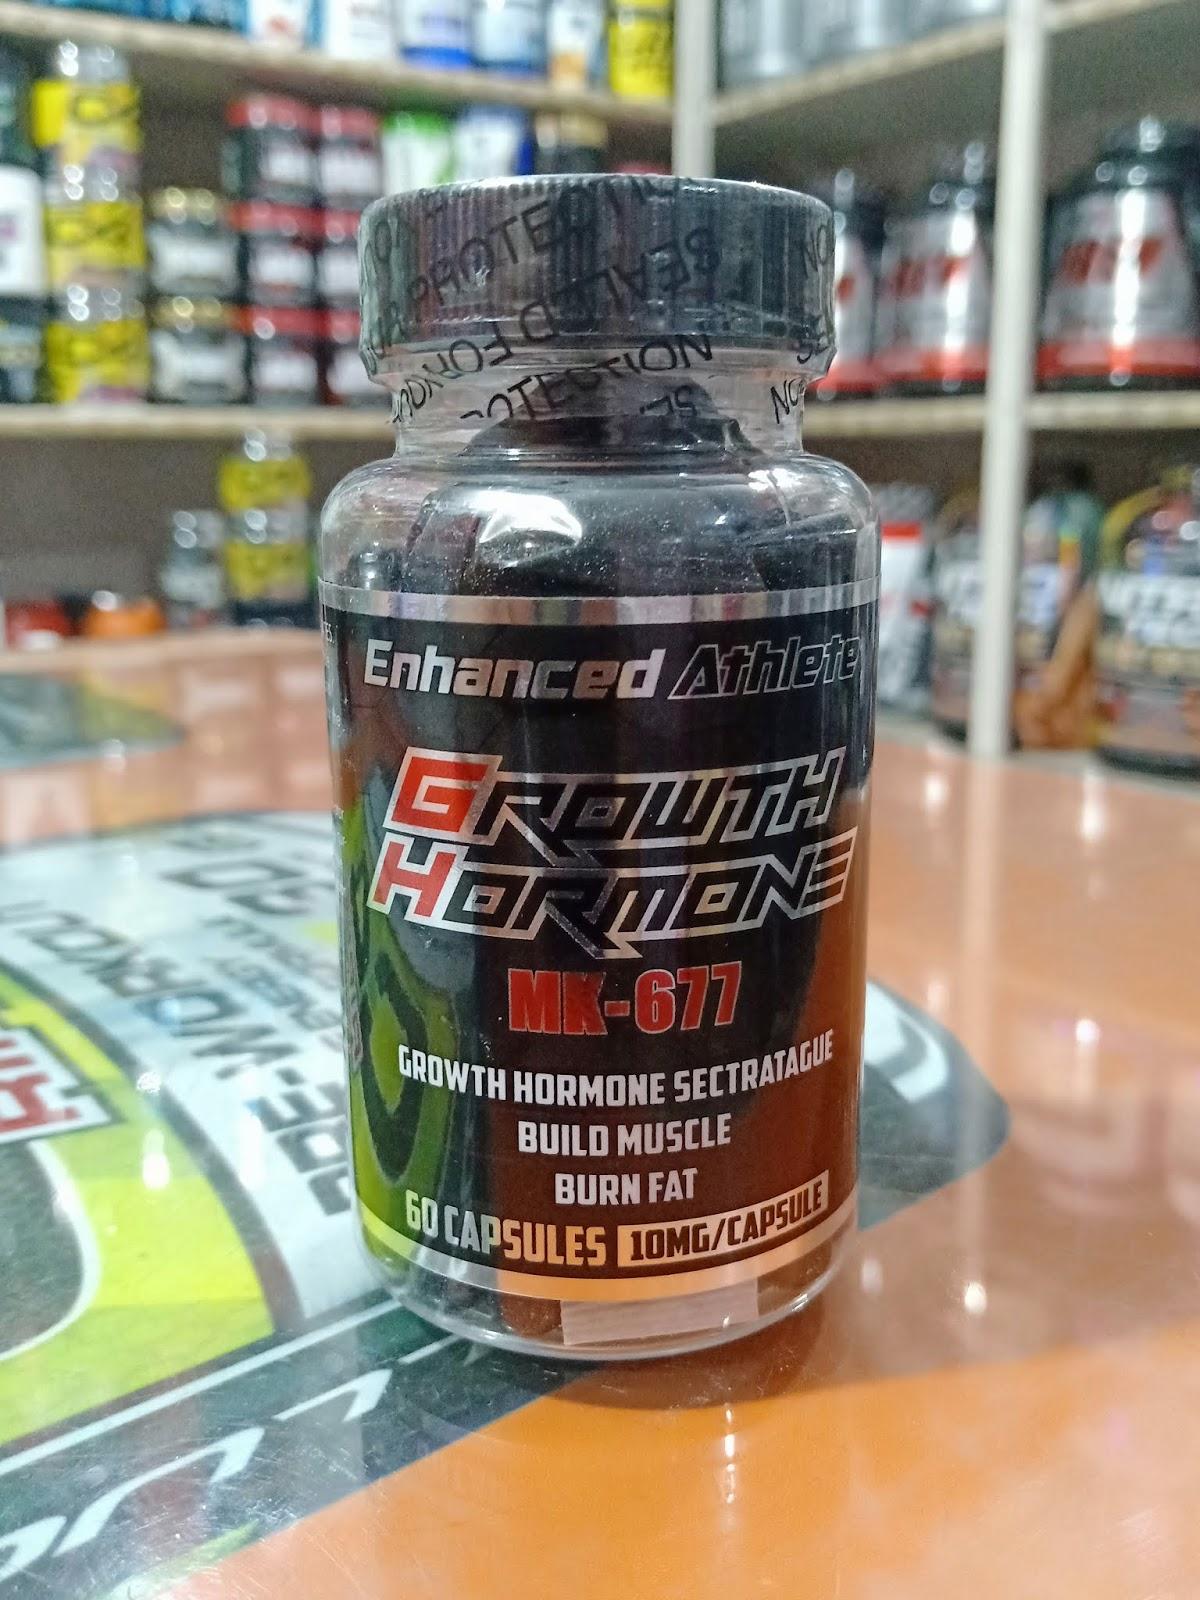 Enhanced Athlete Mk677 60 Capsules 10mg per Cap - NCR Food